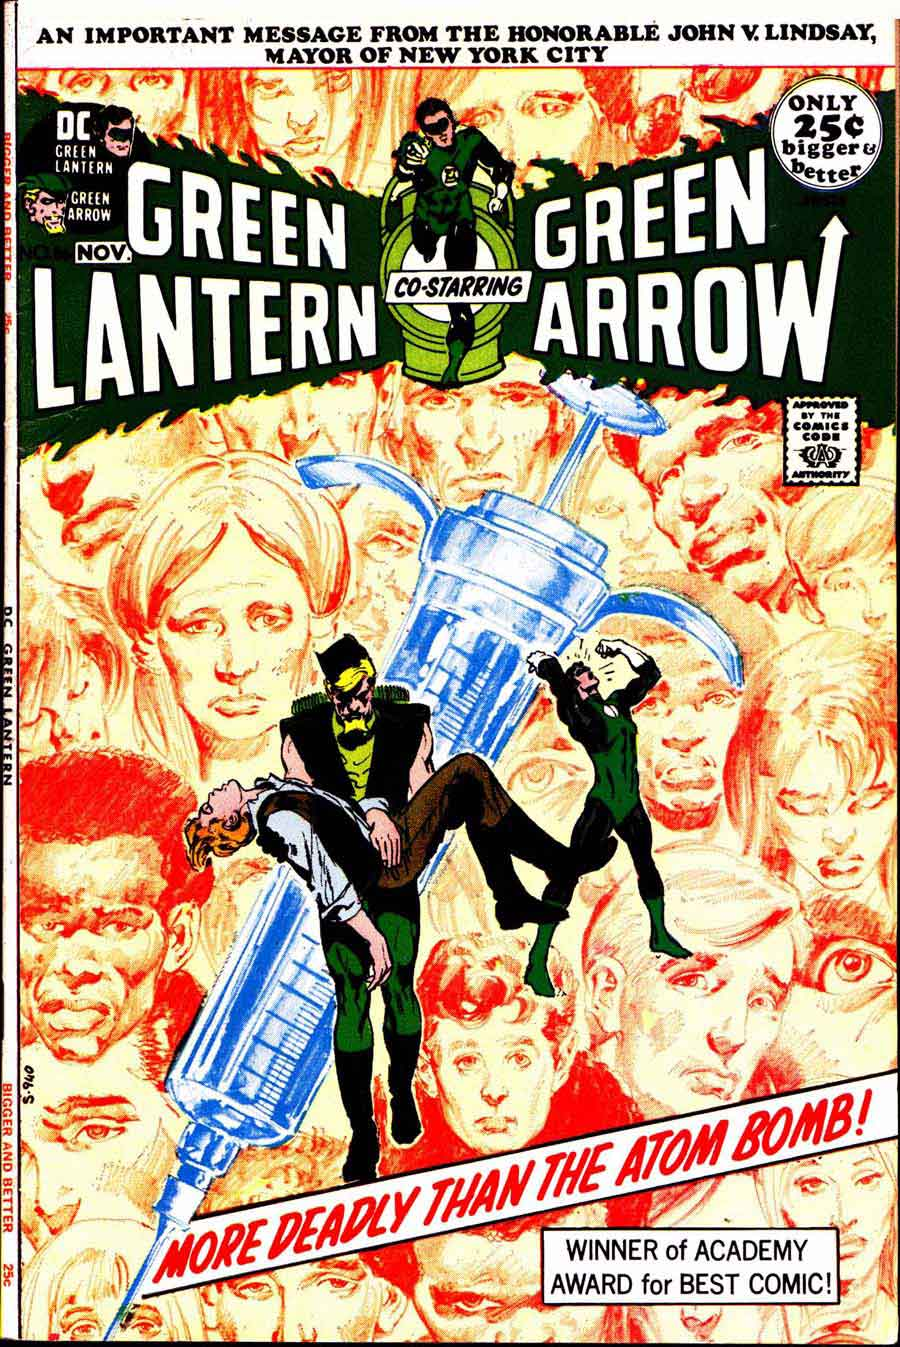 Green Lantern Green Arrow #86 dc comic book cover art by Neal Adams